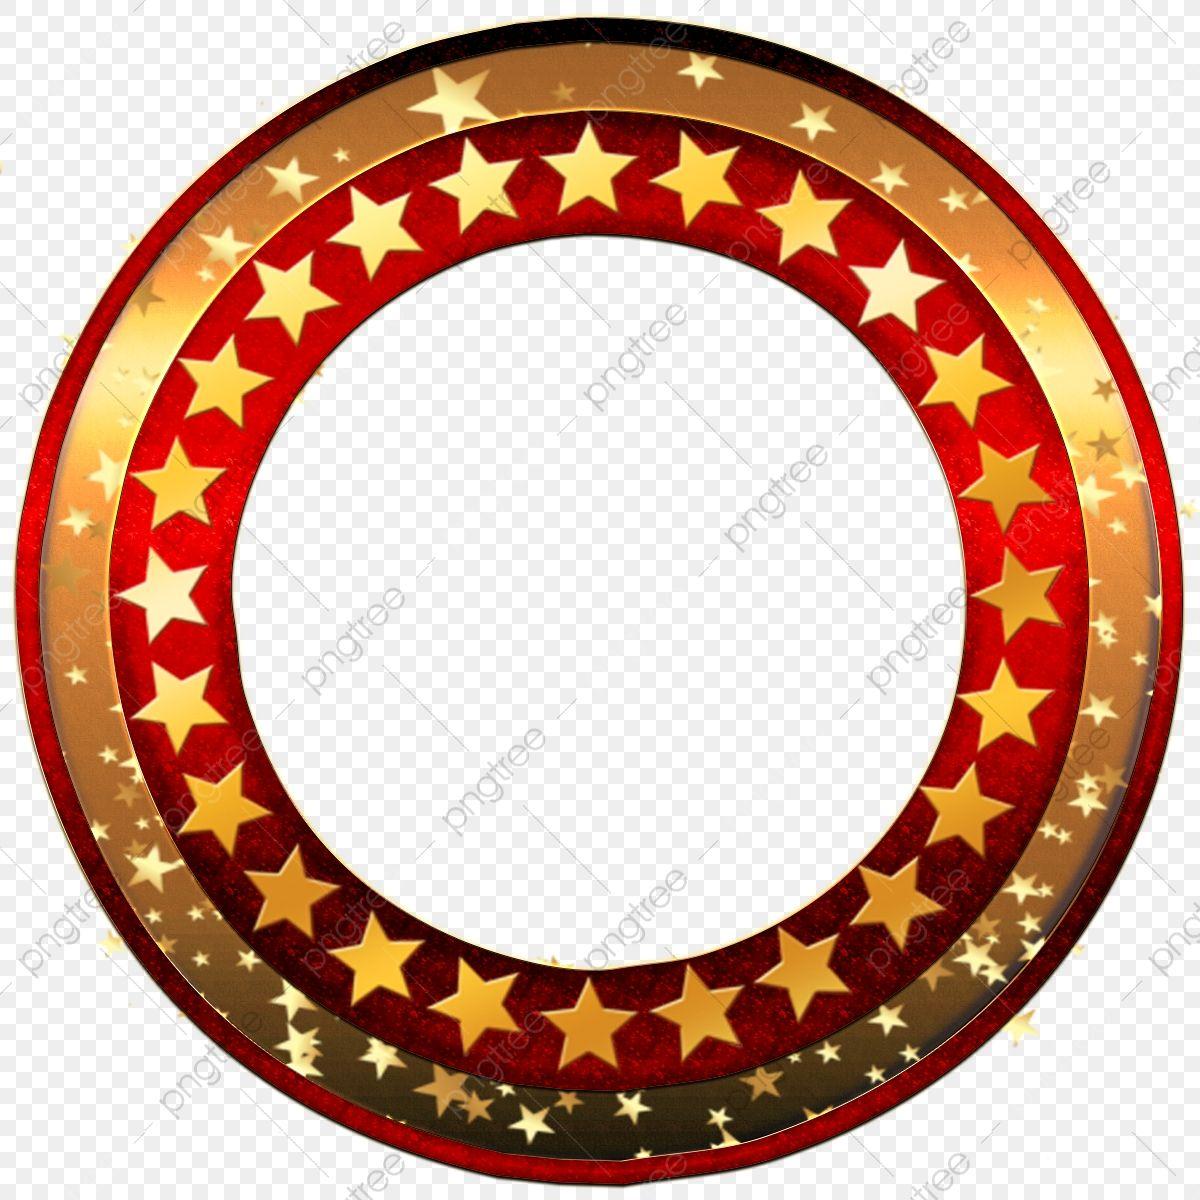 Red Round Frame With Golden Stars Frame Marrige Celebration Png Transparent Clipart Image And Psd File For Free Download Poster Background Design Ornament Frame Golden Star